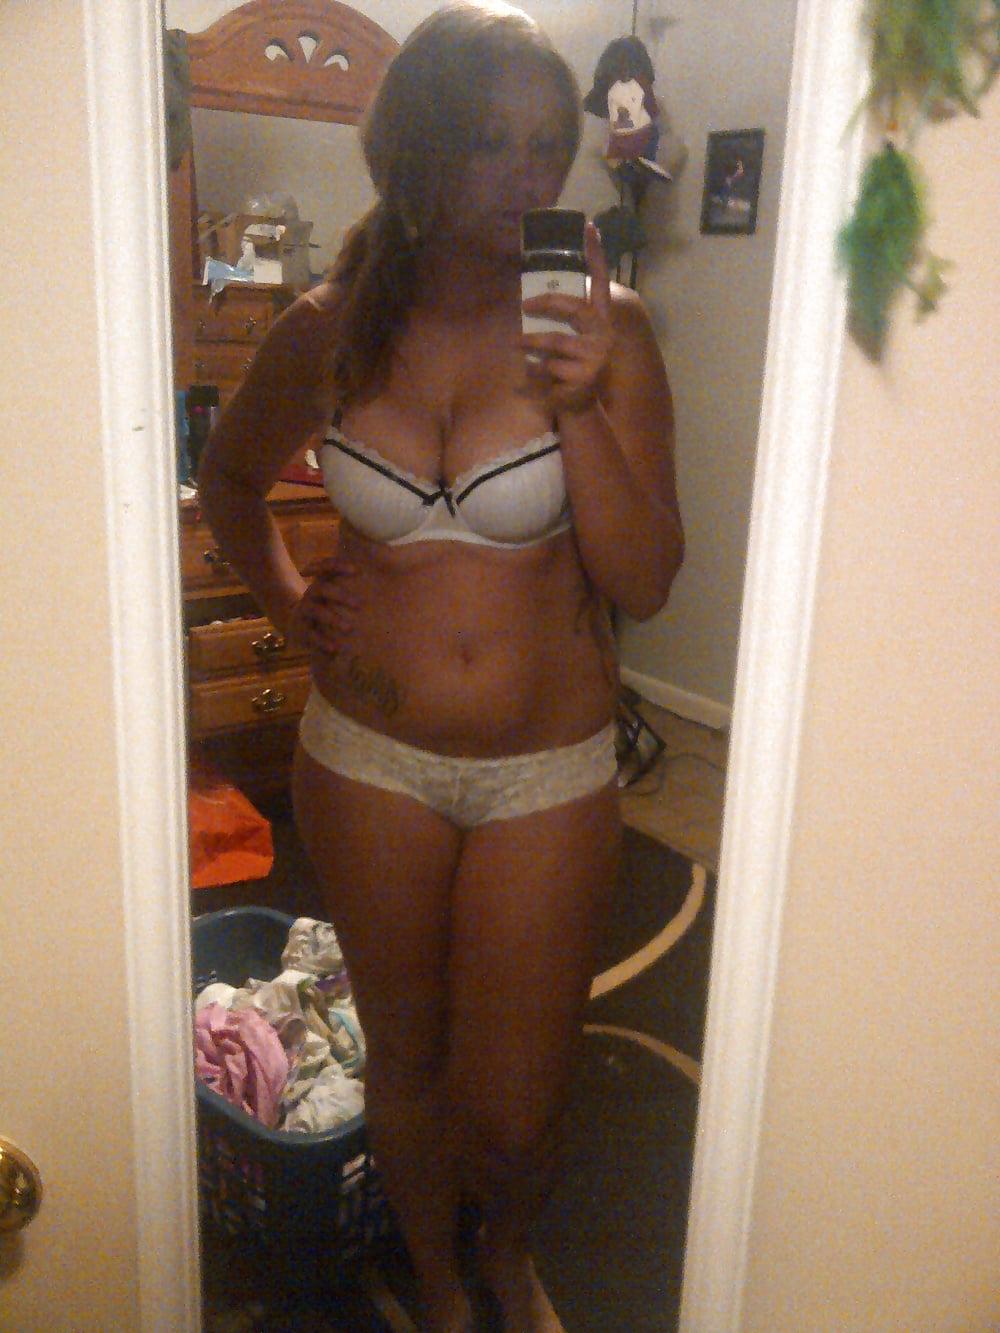 submitted-bikini-self-pics-xxx-tean-porn